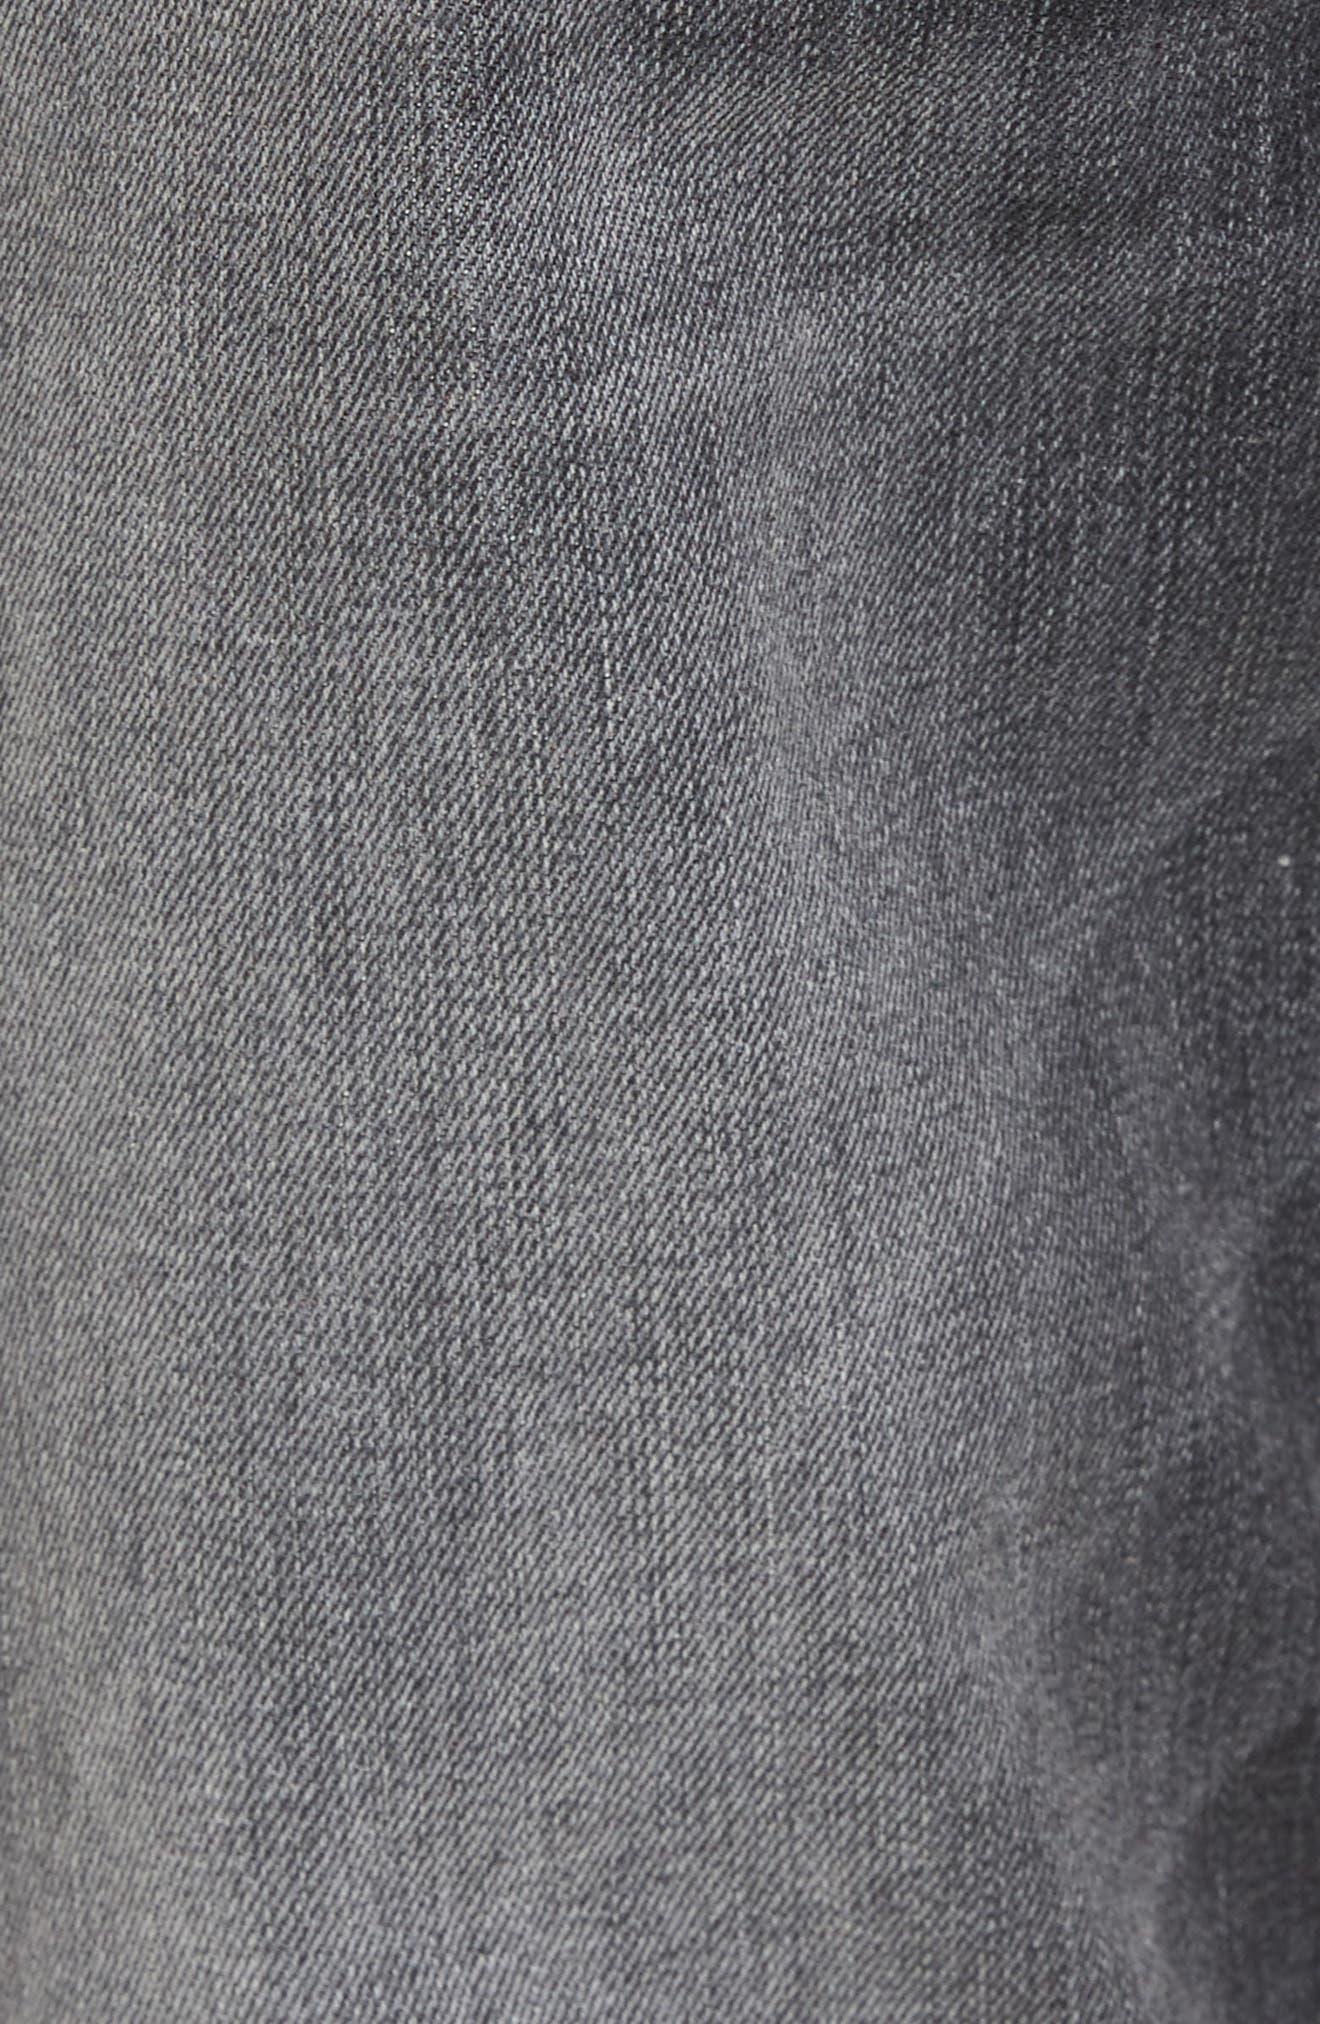 Axl Skinny Fit Jeans,                             Alternate thumbnail 5, color,                             Venture